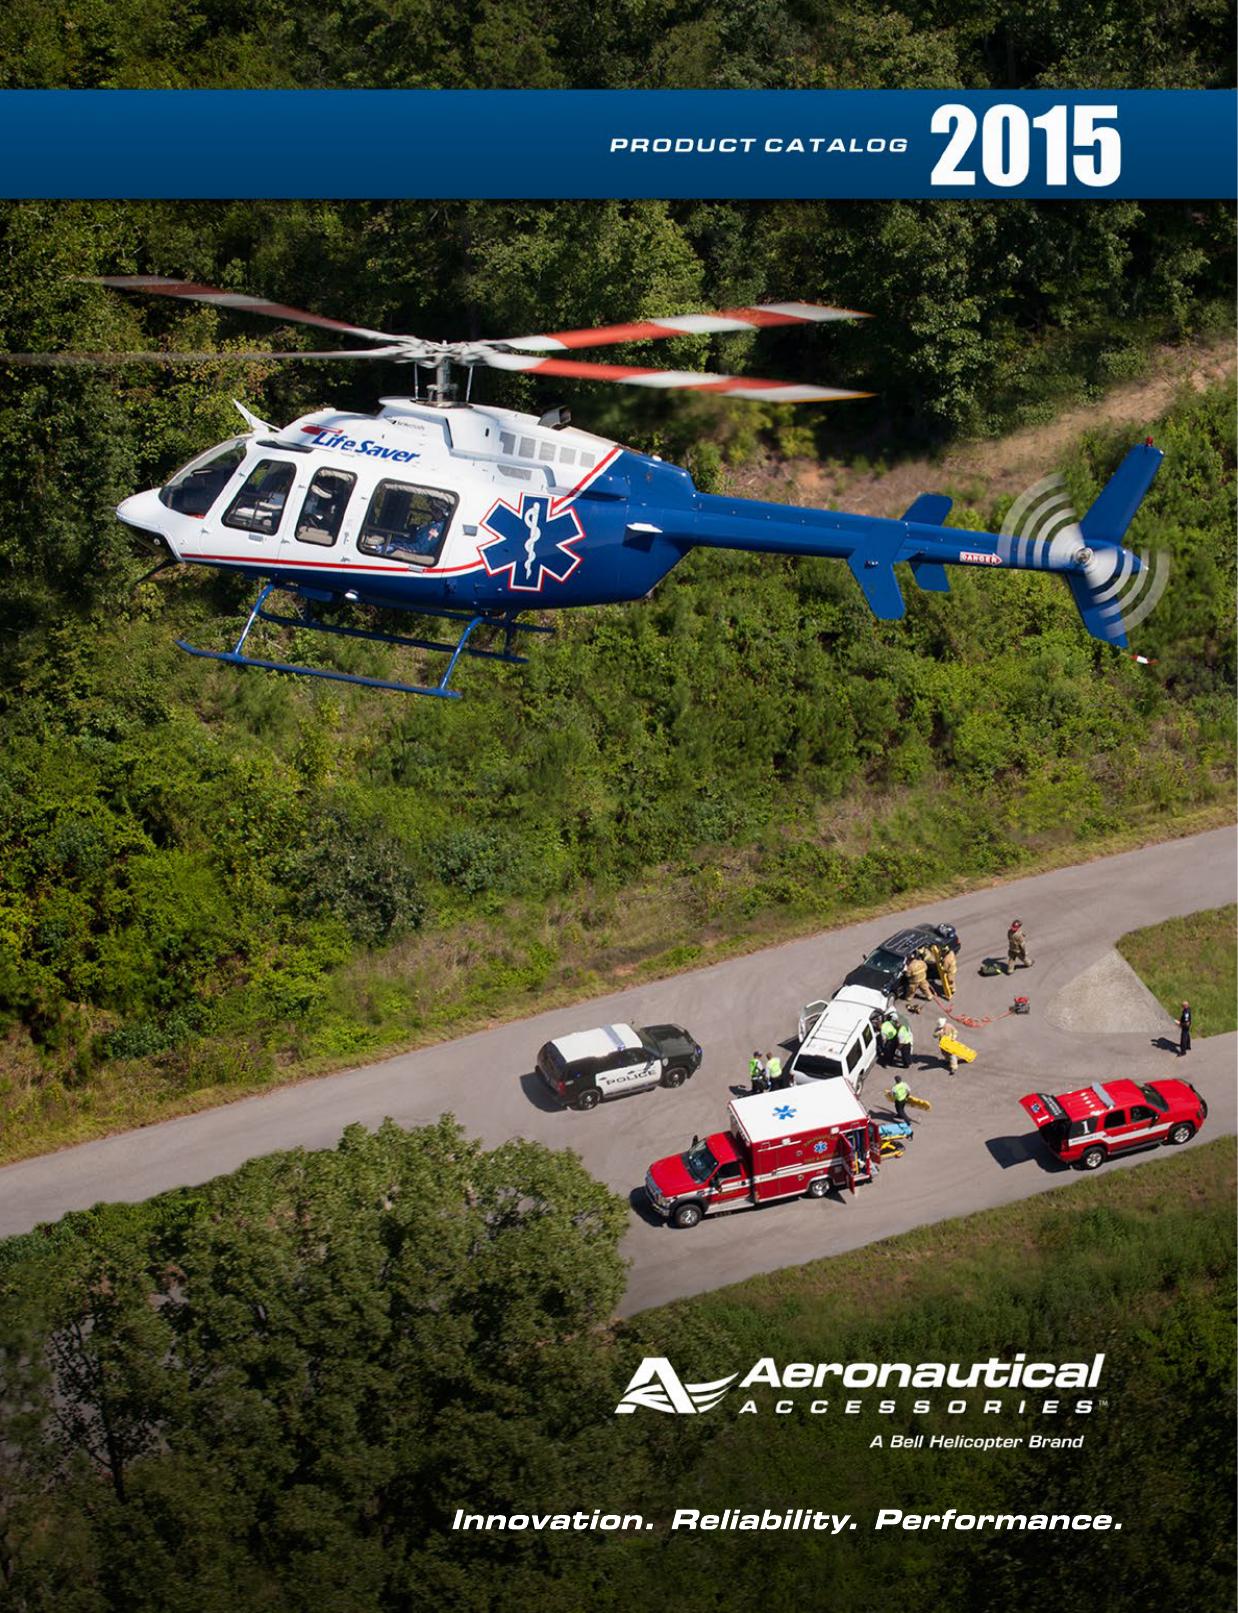 2015 Aeronautical Accessories Catalog(NEW)